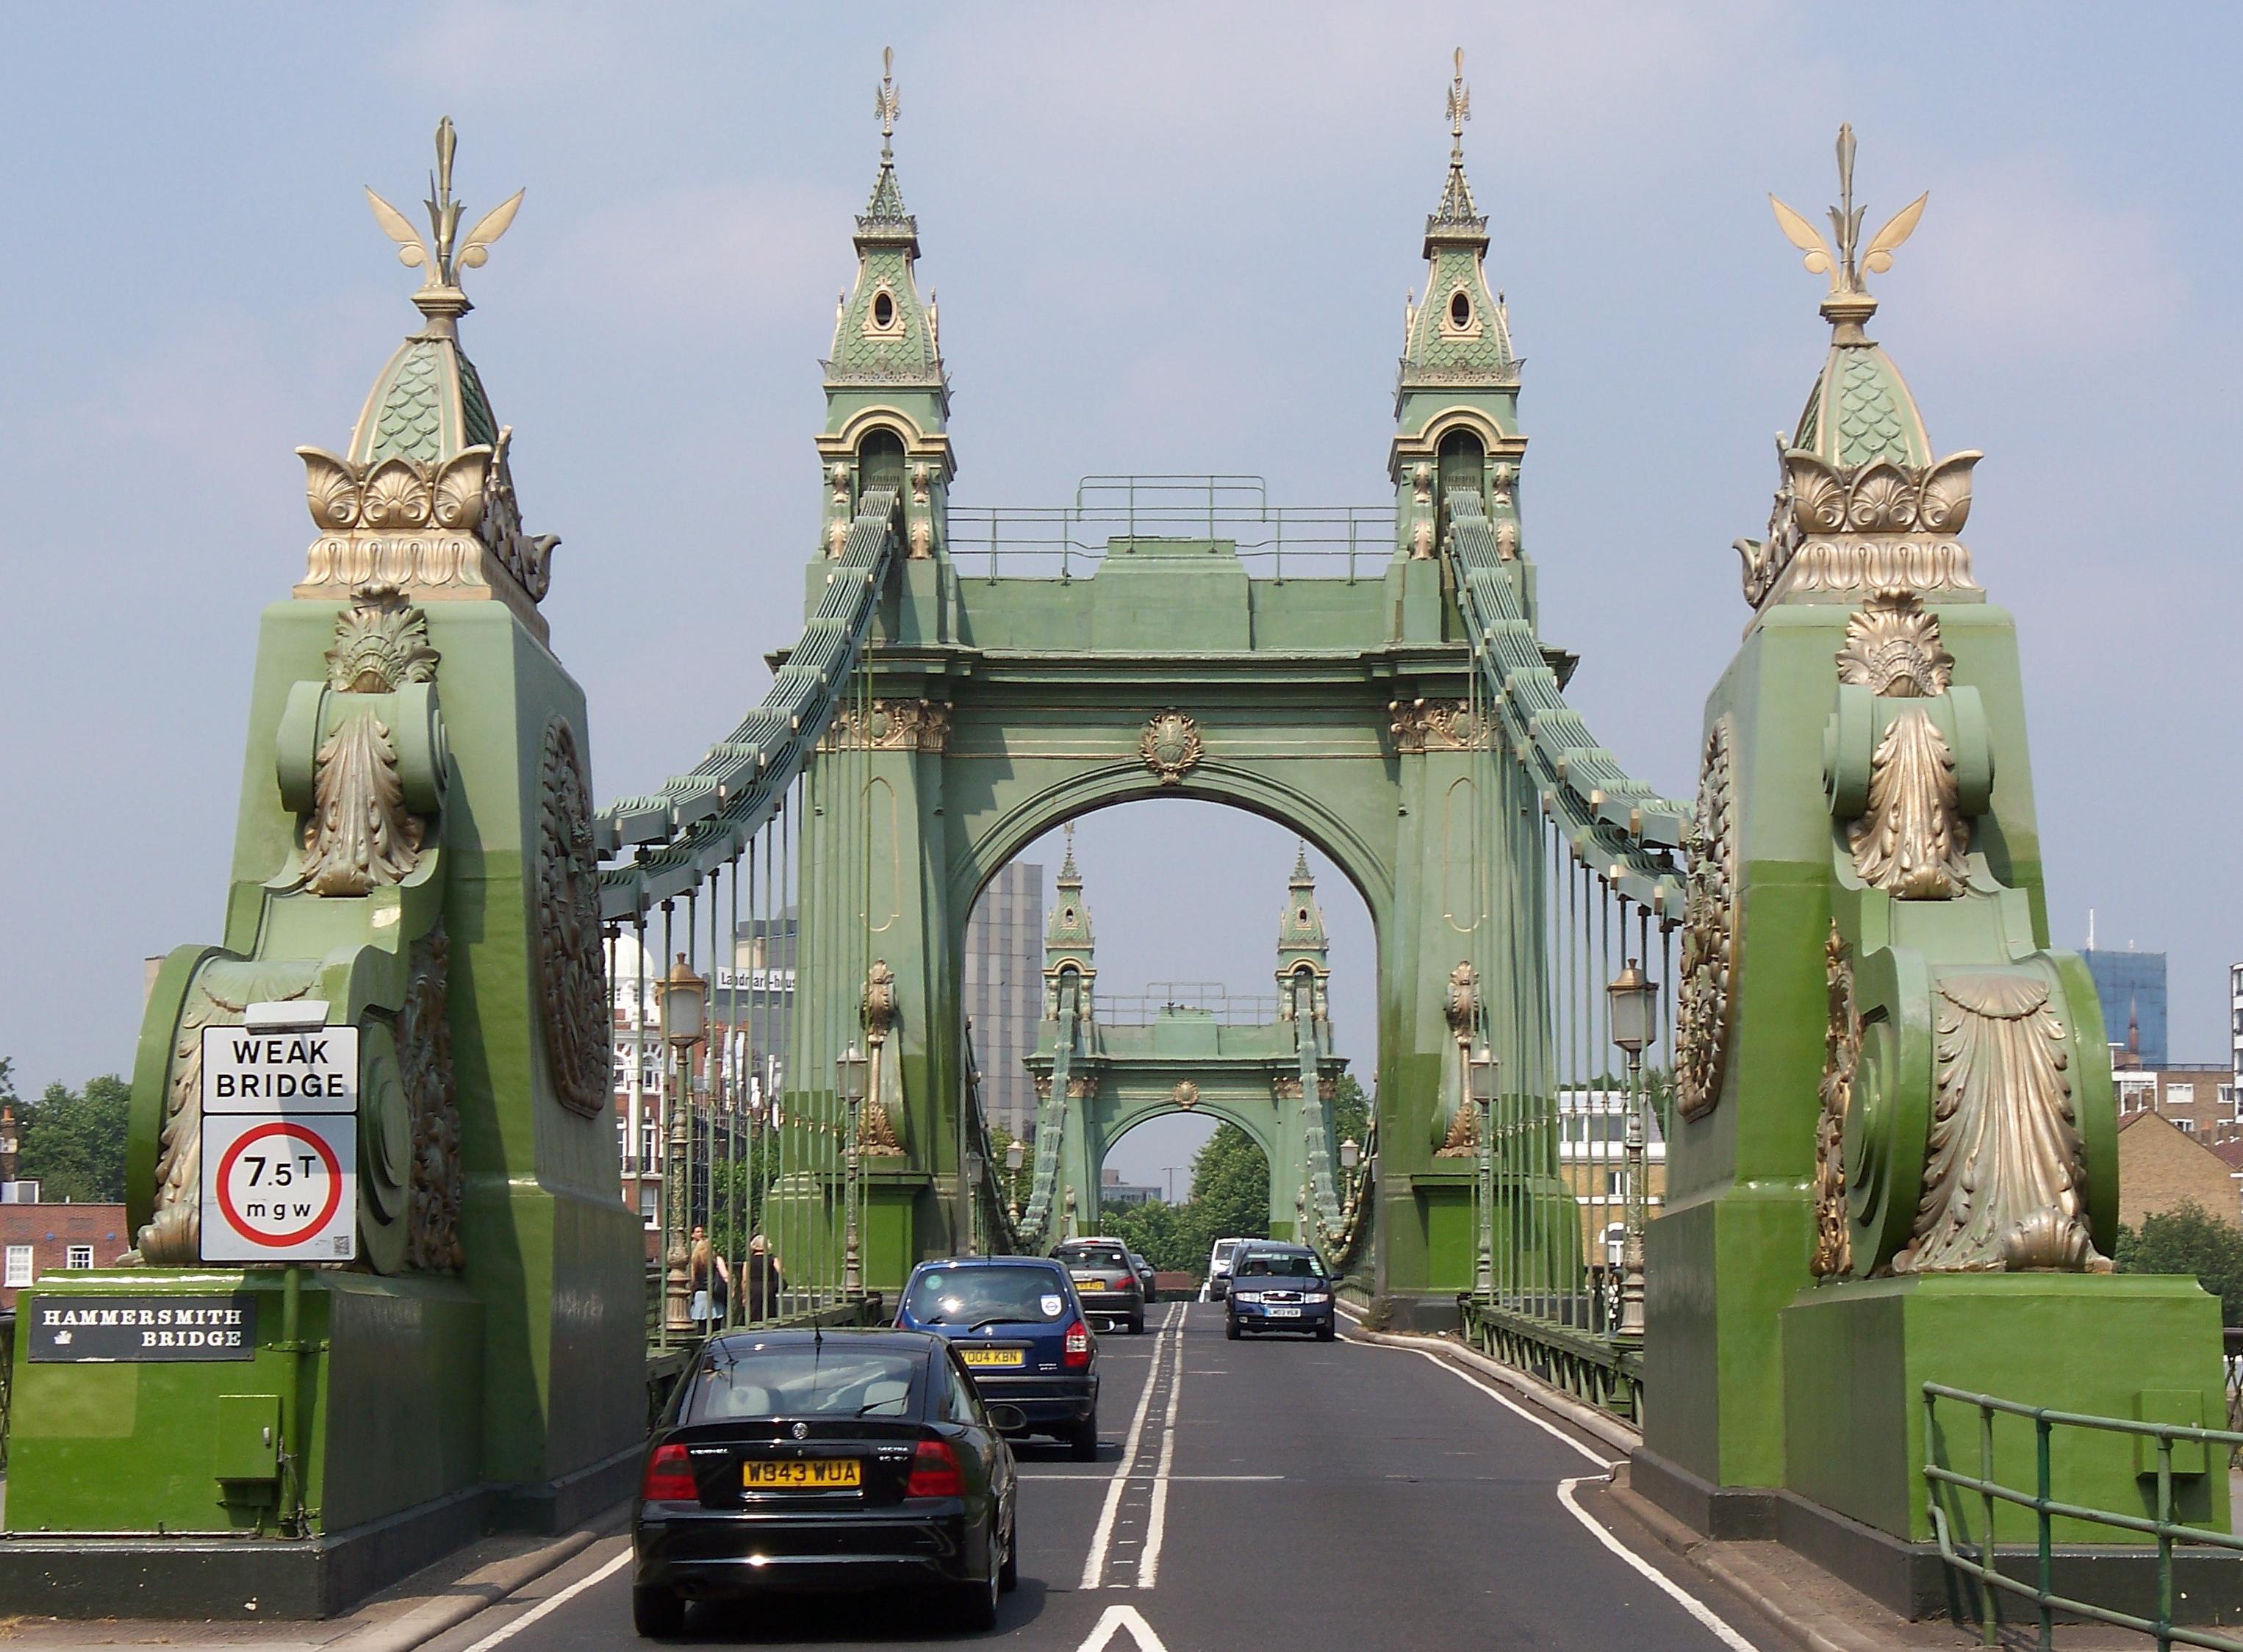 Hammersmith_Bridge_entrance_(South)